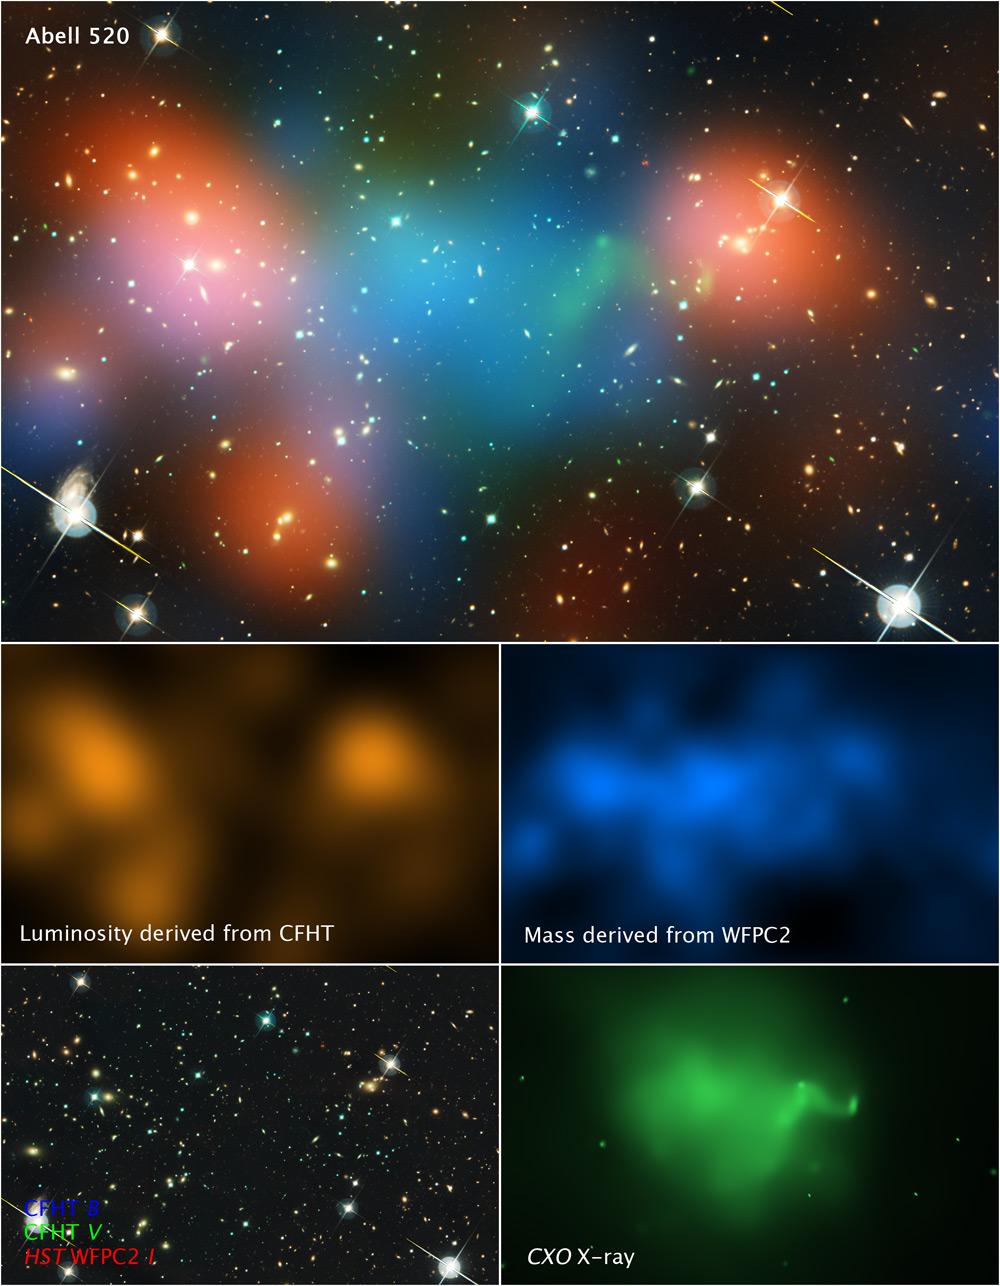 Strange Lump of Dark Matter Shouldn't Exist, But Does